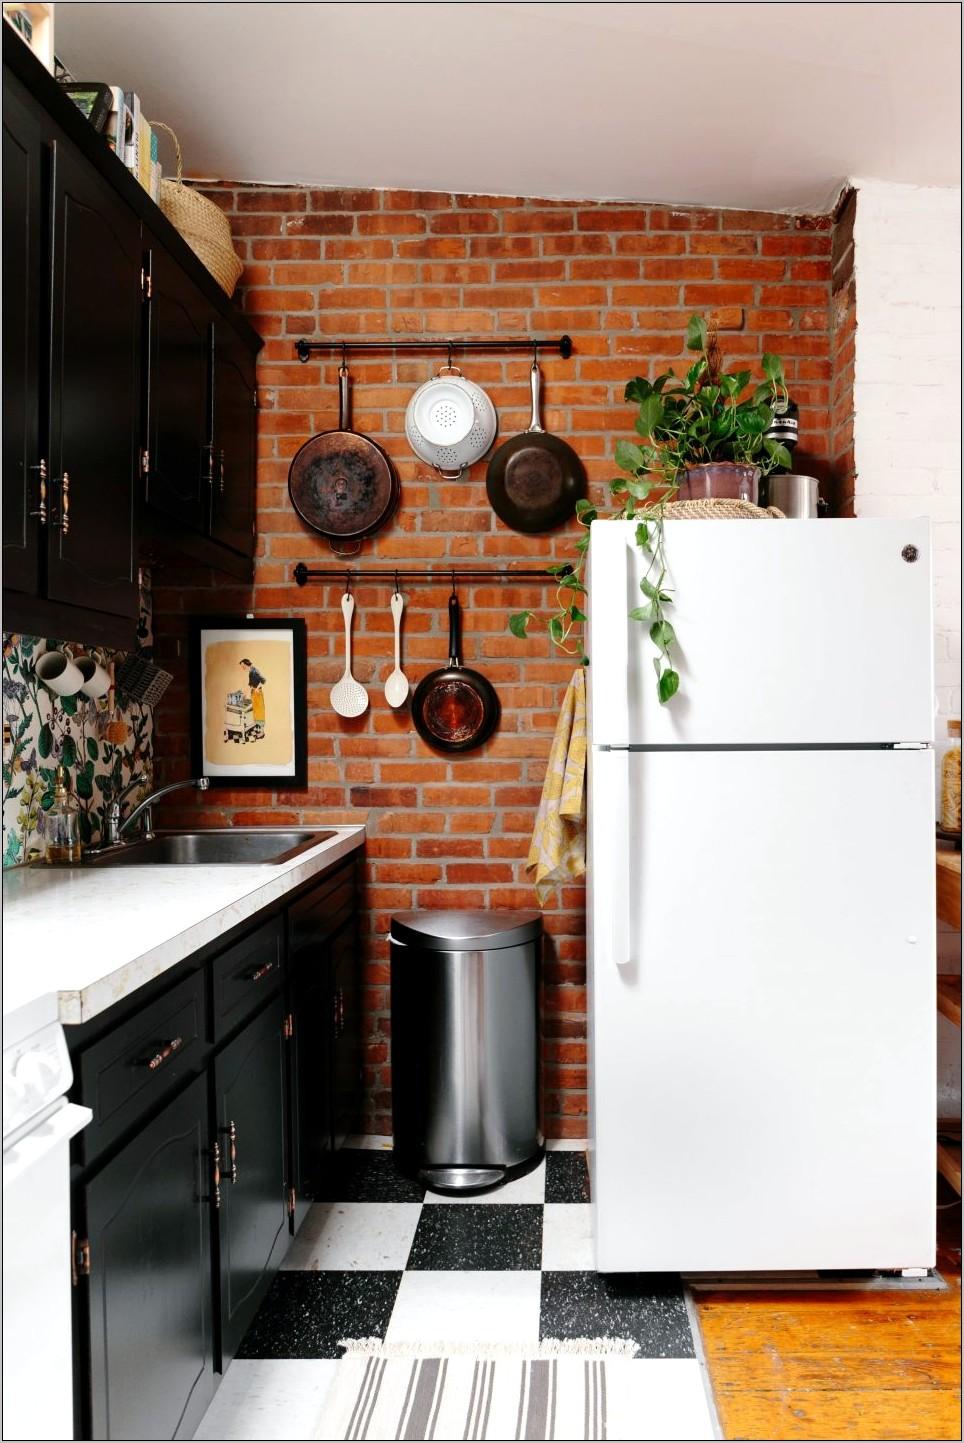 Studio Kitchen Decorating Ideas